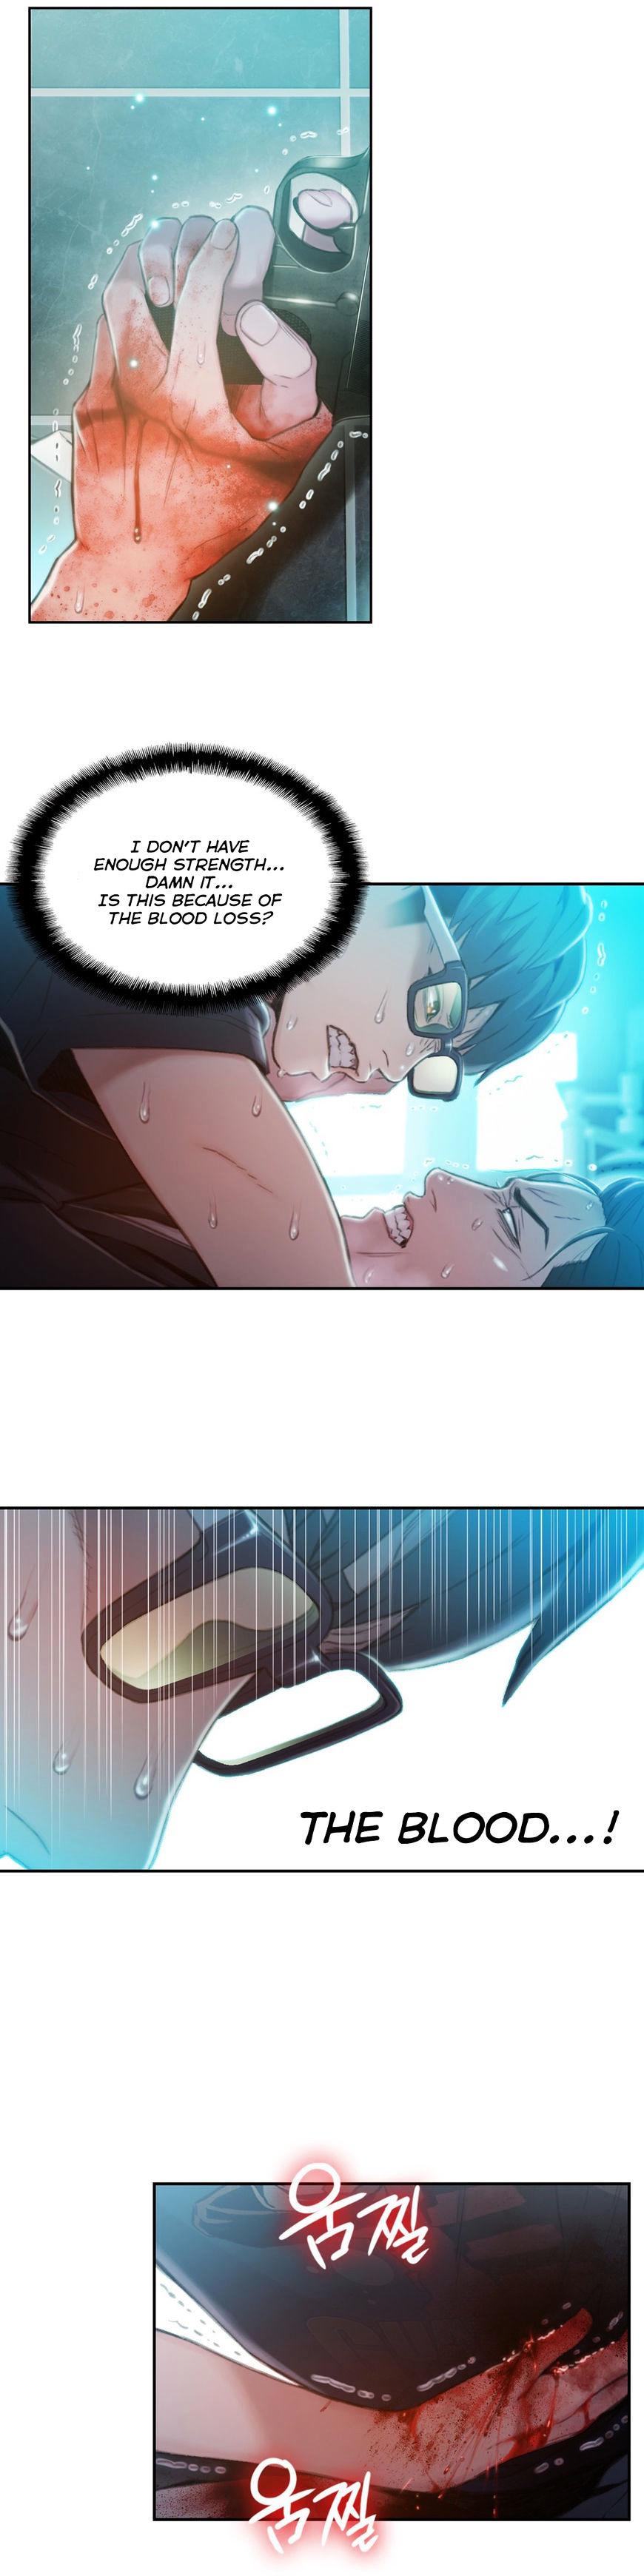 Sweet Guy Chapter 73 Full Manga Read Scan Image 23